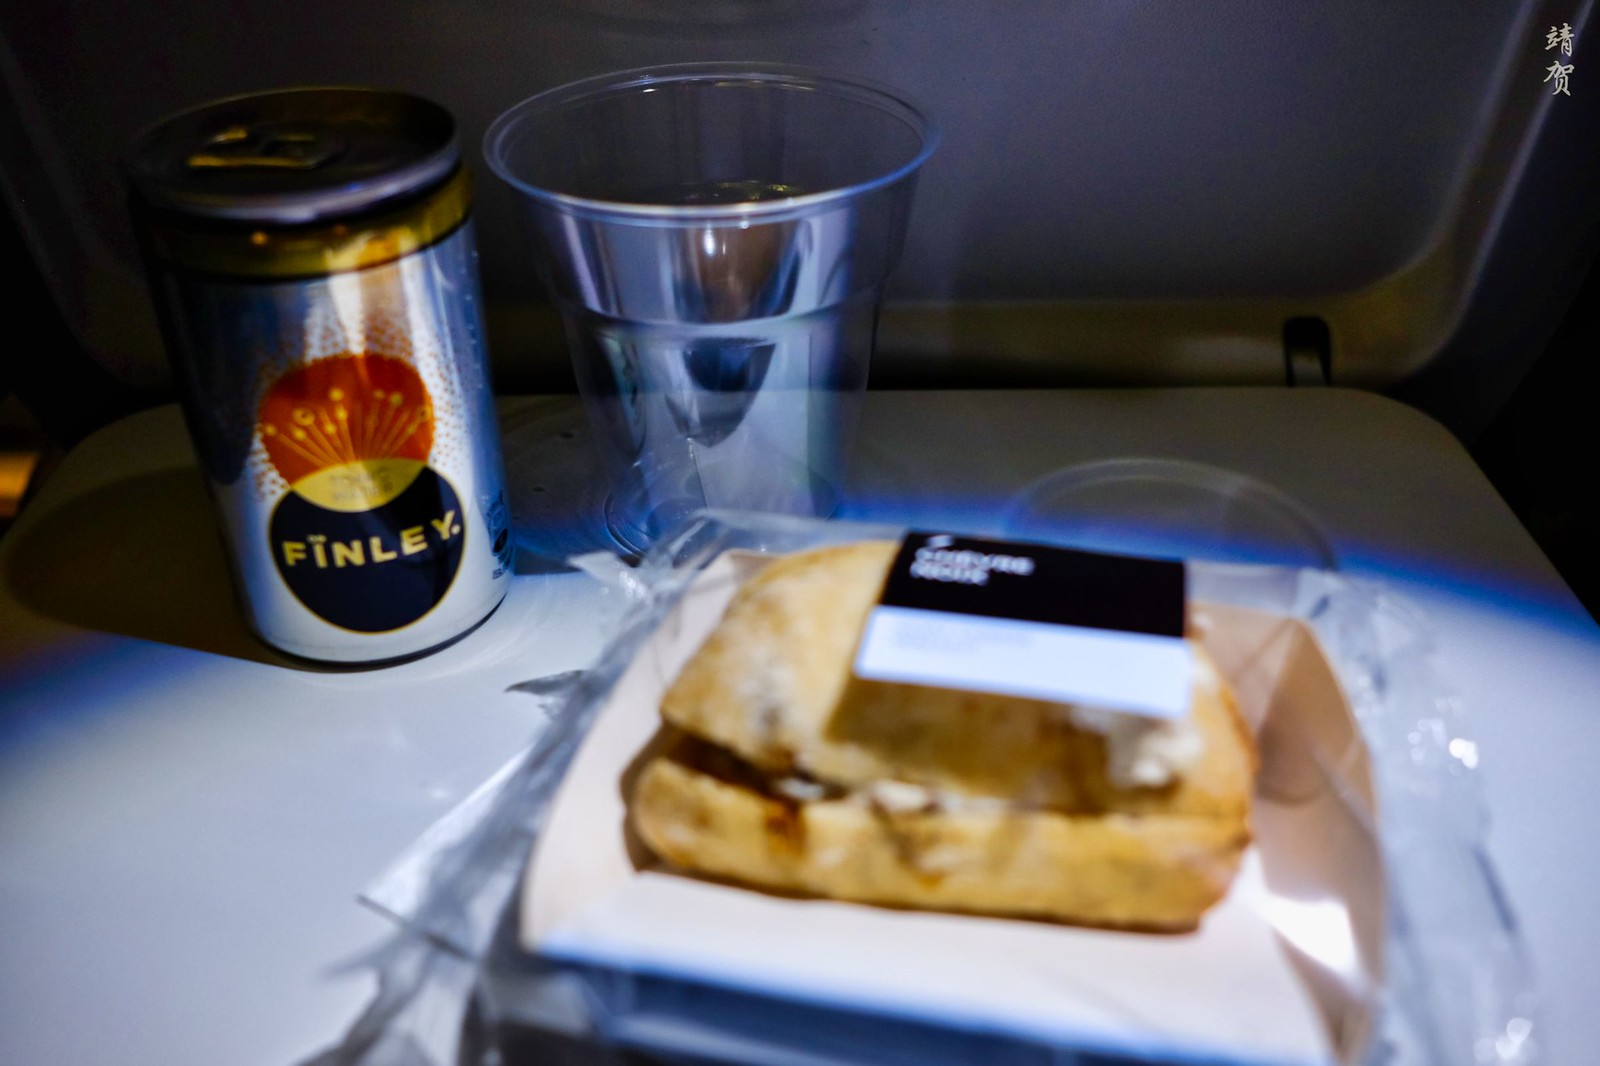 Inflight snack service